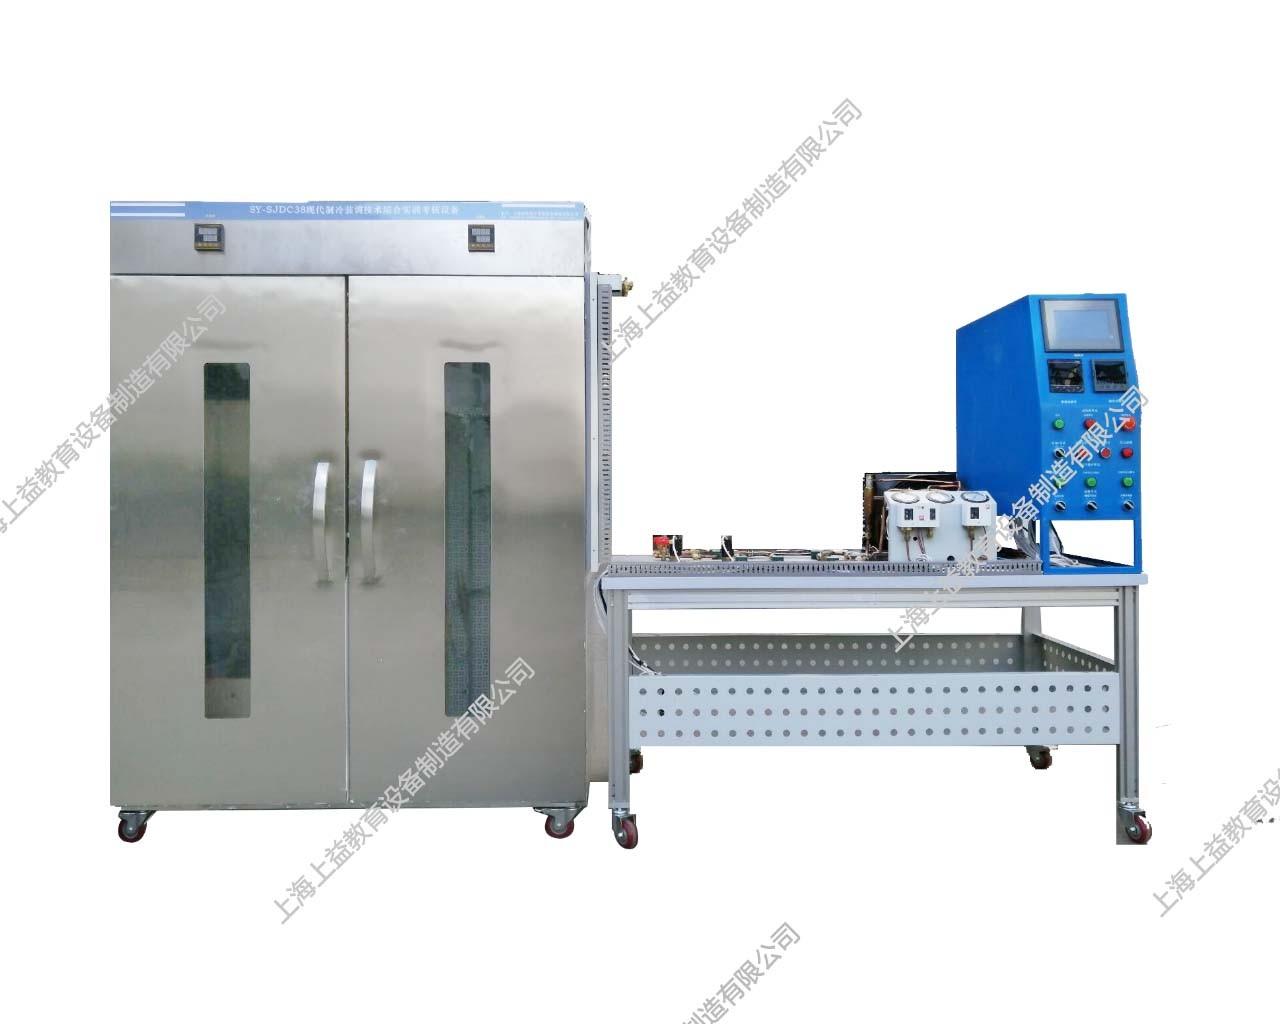 SY-SJDC38型 现代制冷装调技术综合wwwlehu8viplehu68vip设备